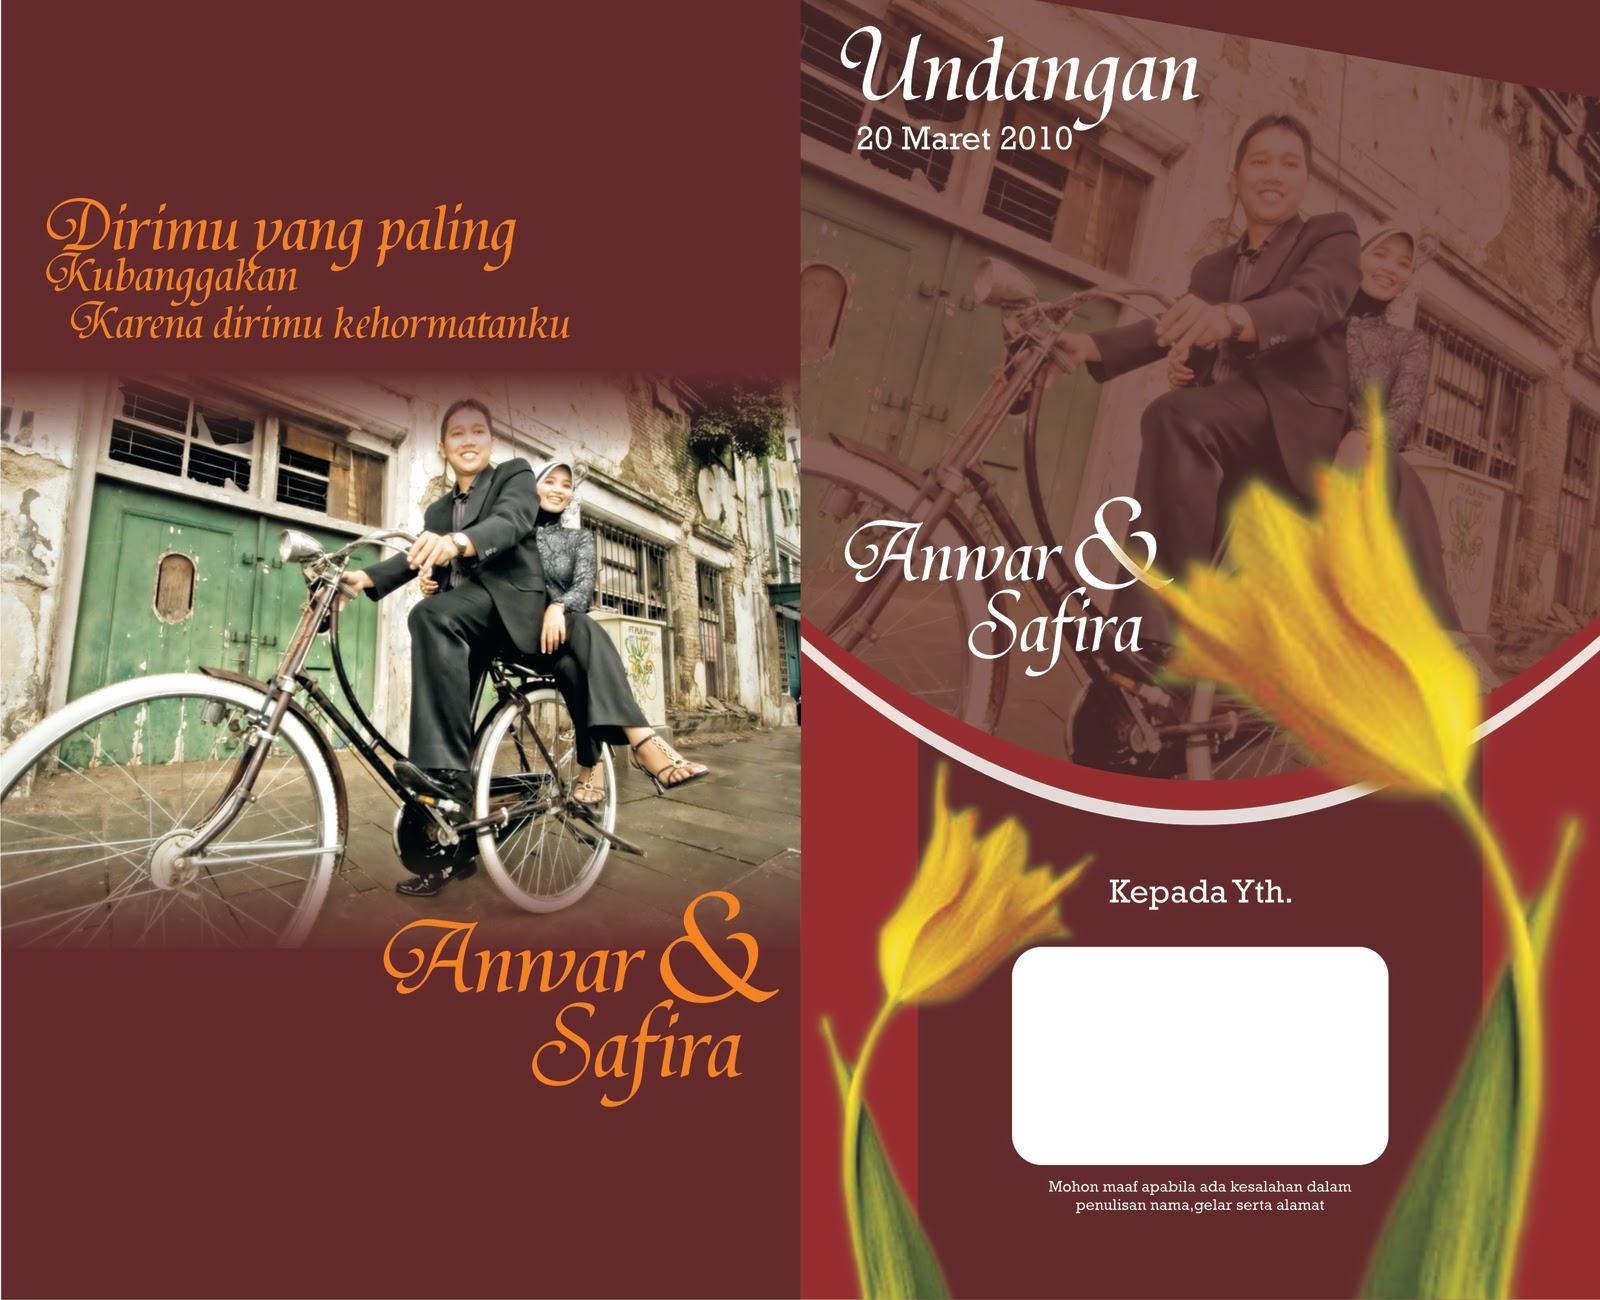 Kumpulan Desain Undangan: September 2011